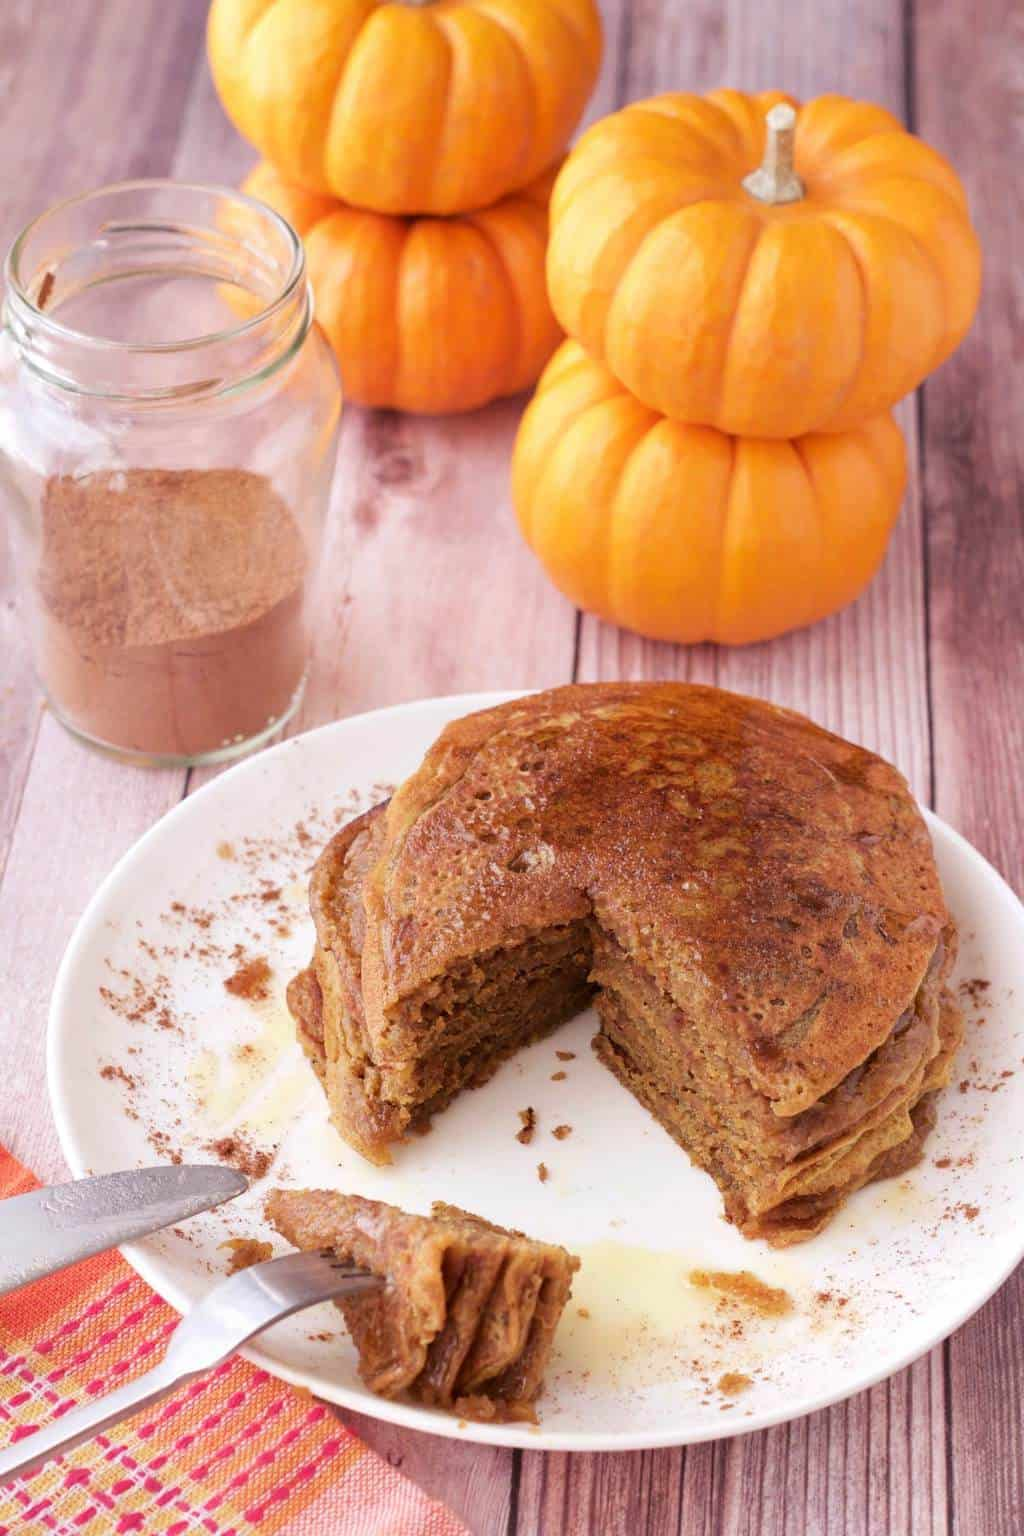 Vegan Pumpkin Pancakes. Perfectly spiced and fabulous for breakfast! #vegan #lovingitvegan #pumpkinpancakes #breakfast